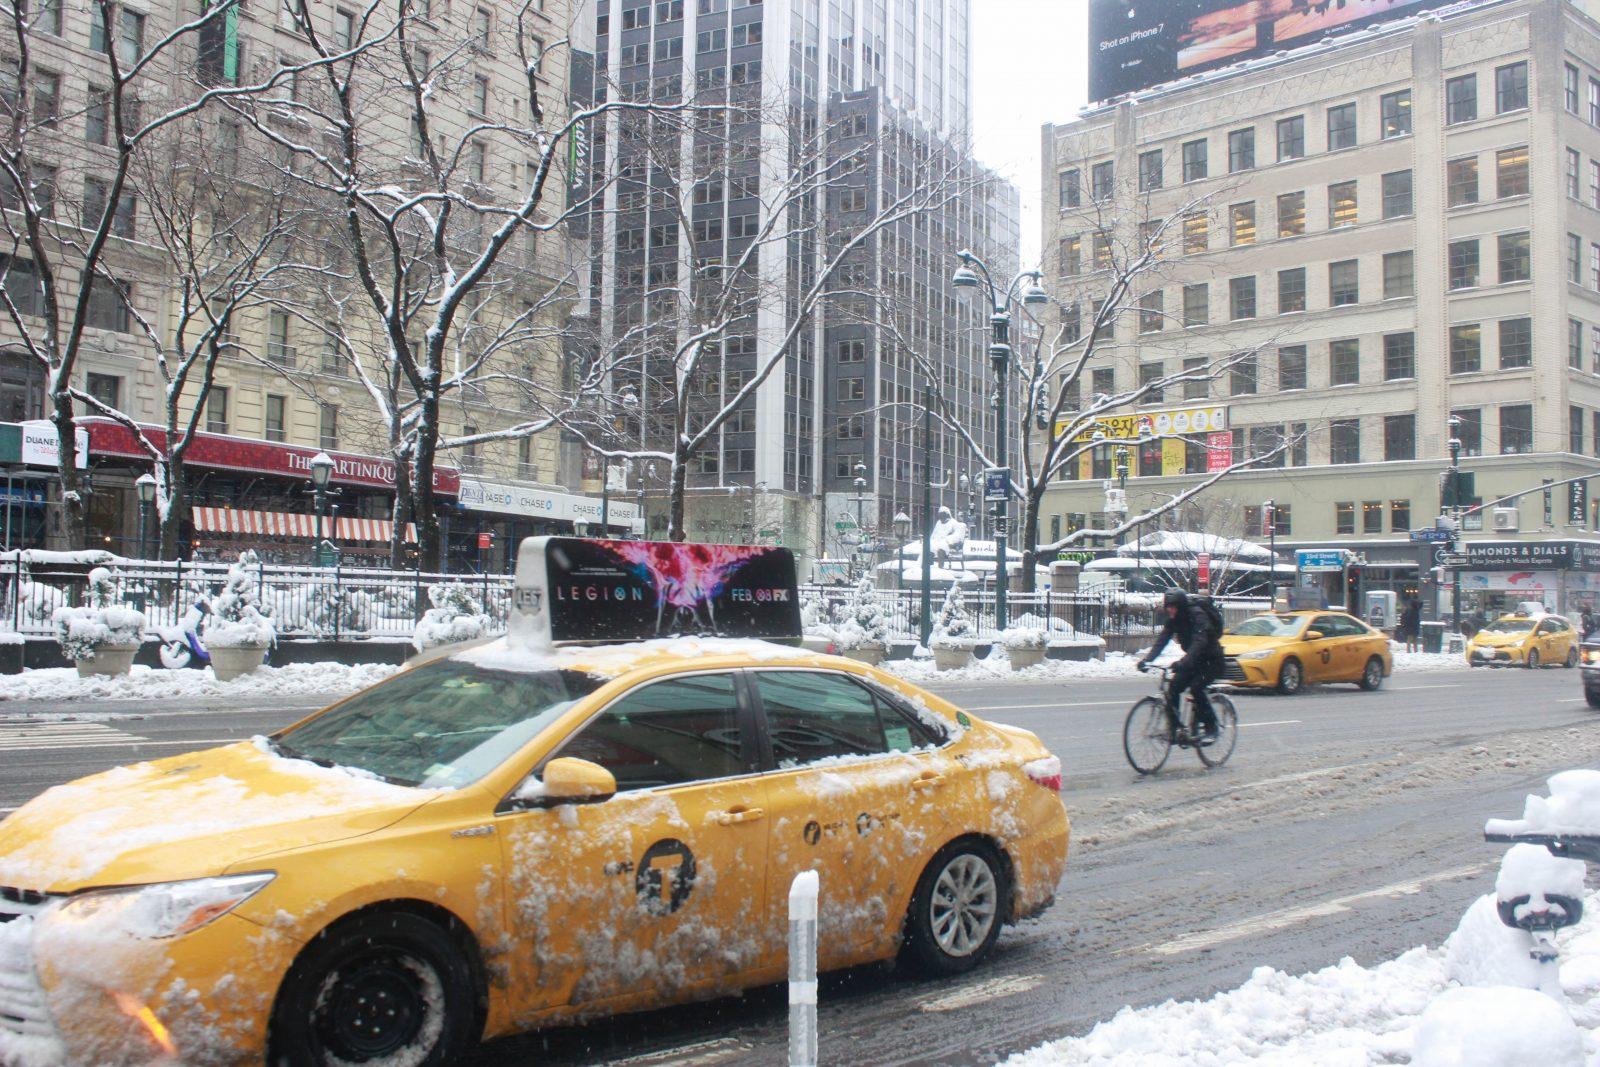 Blizard In New York & New Jersey